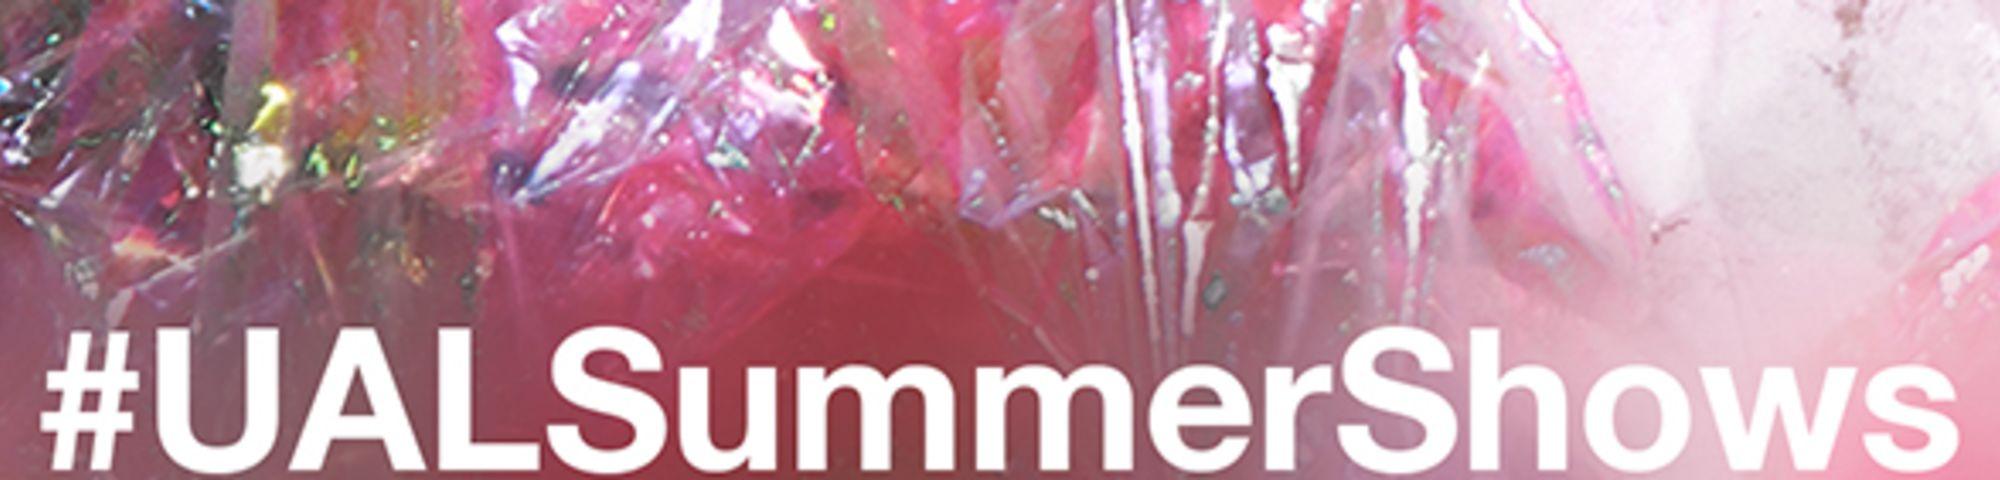 summer shows wordpress image